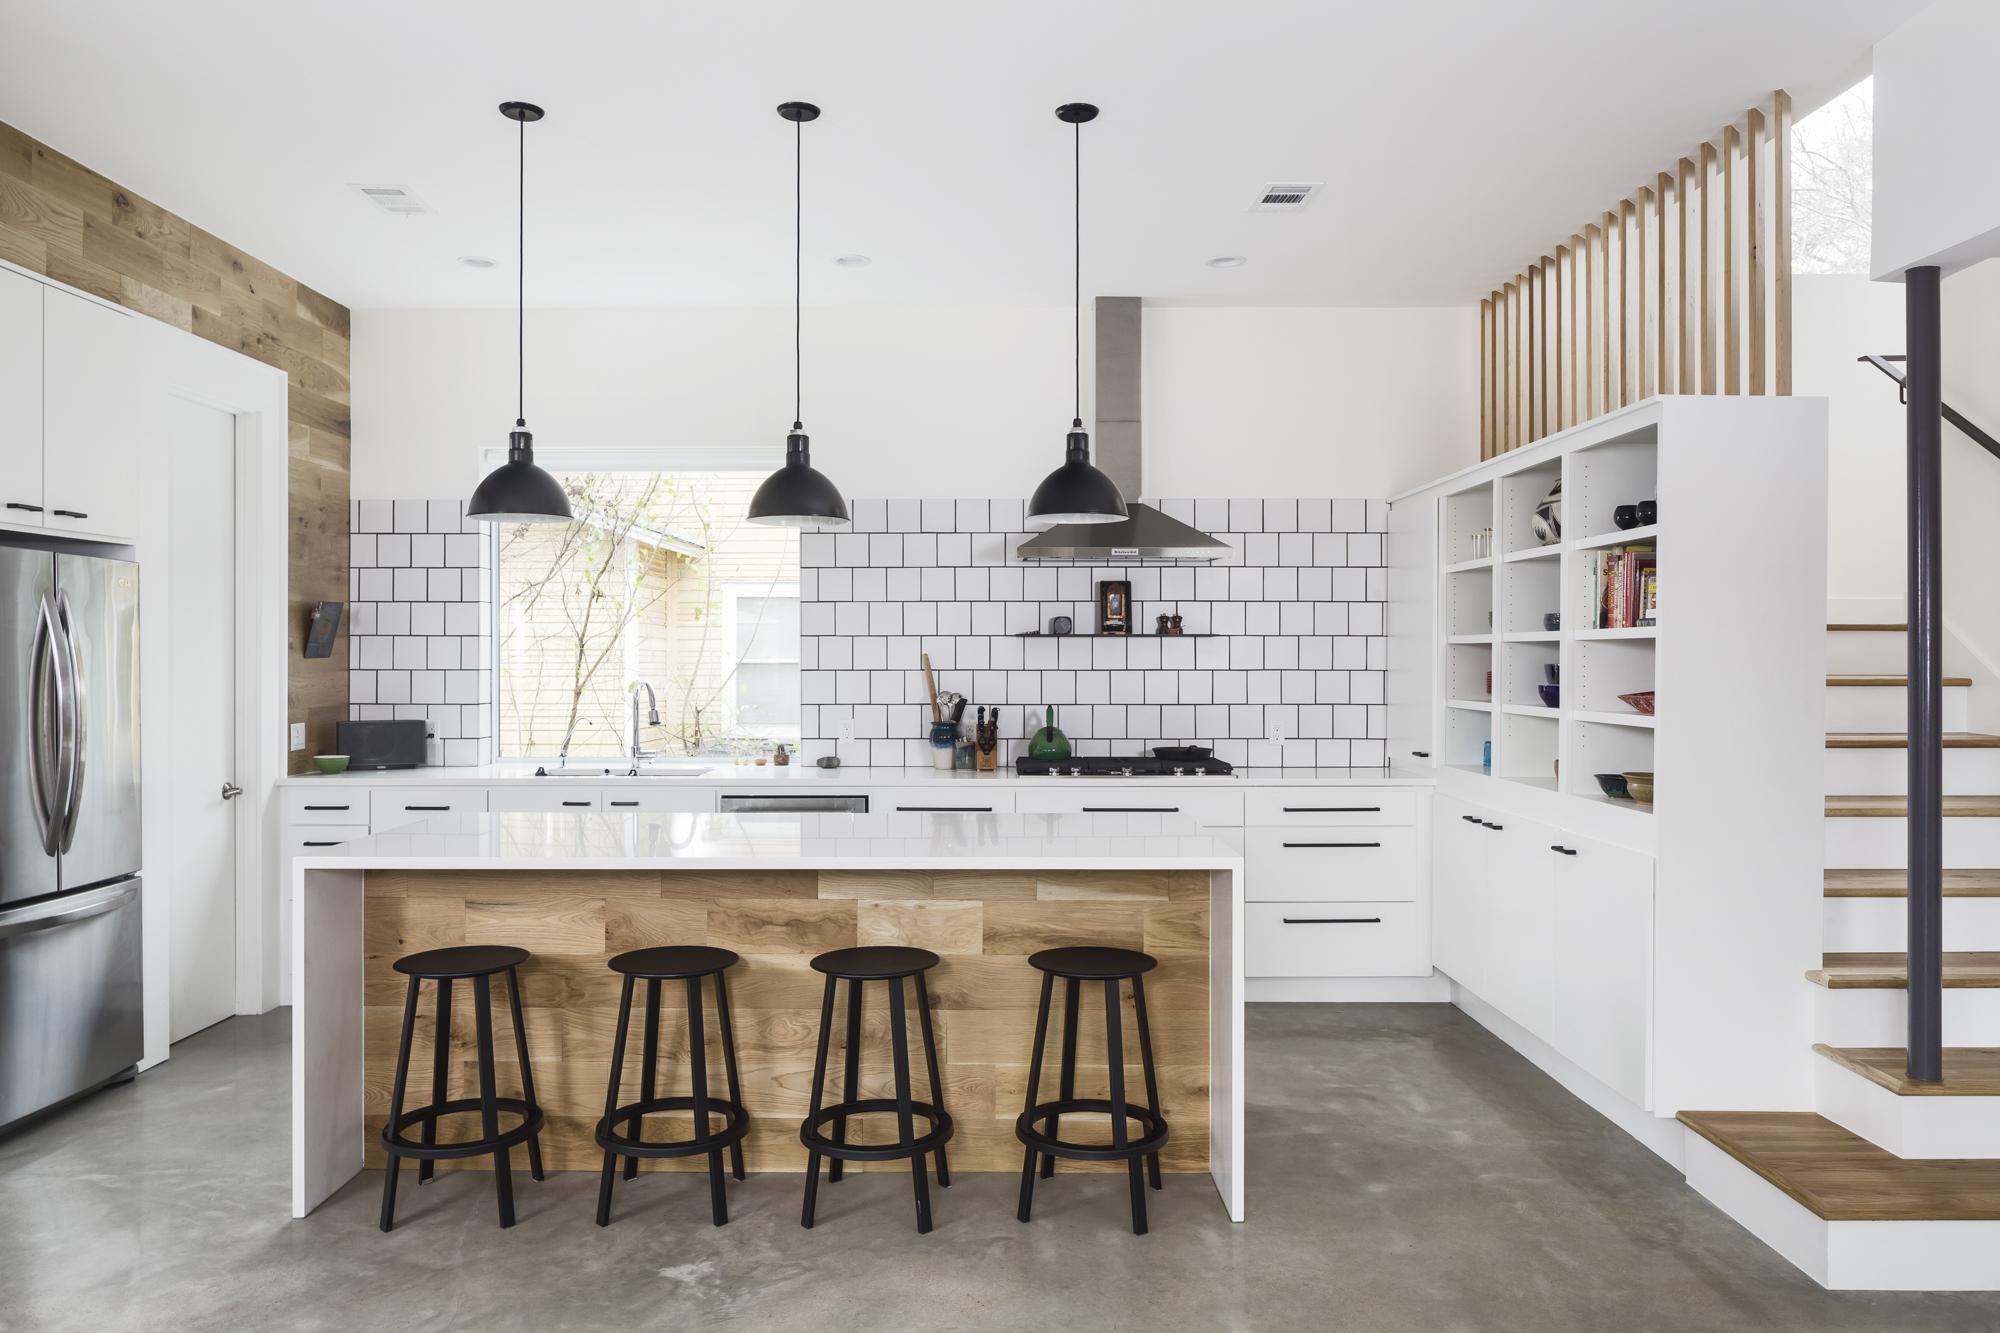 2016_FULL_RIGHTS_WEB_VERSION_img_residential_q1_kitchen_backsplash_davenport_builders_andrea_calo_photo_ann_lowe_design_adam_julie_butler_kitchen_backsplash_daisy_6x6_half_offset_FC156437.jpg?mtime=20181212140644#asset:428844